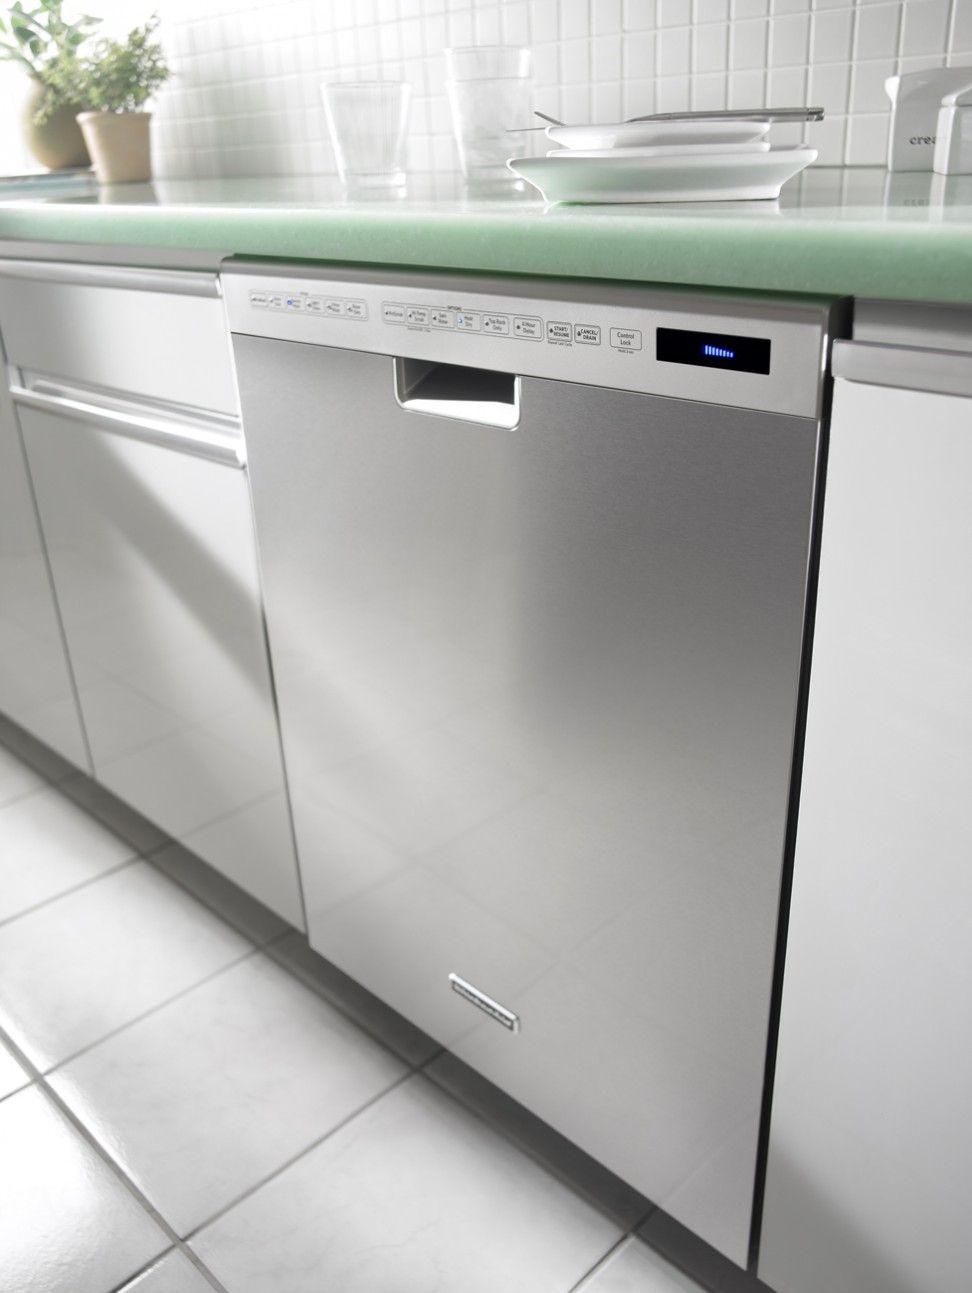 Kitchenaid Dishwasher Reviews And Room Decorating Tips Homes ...